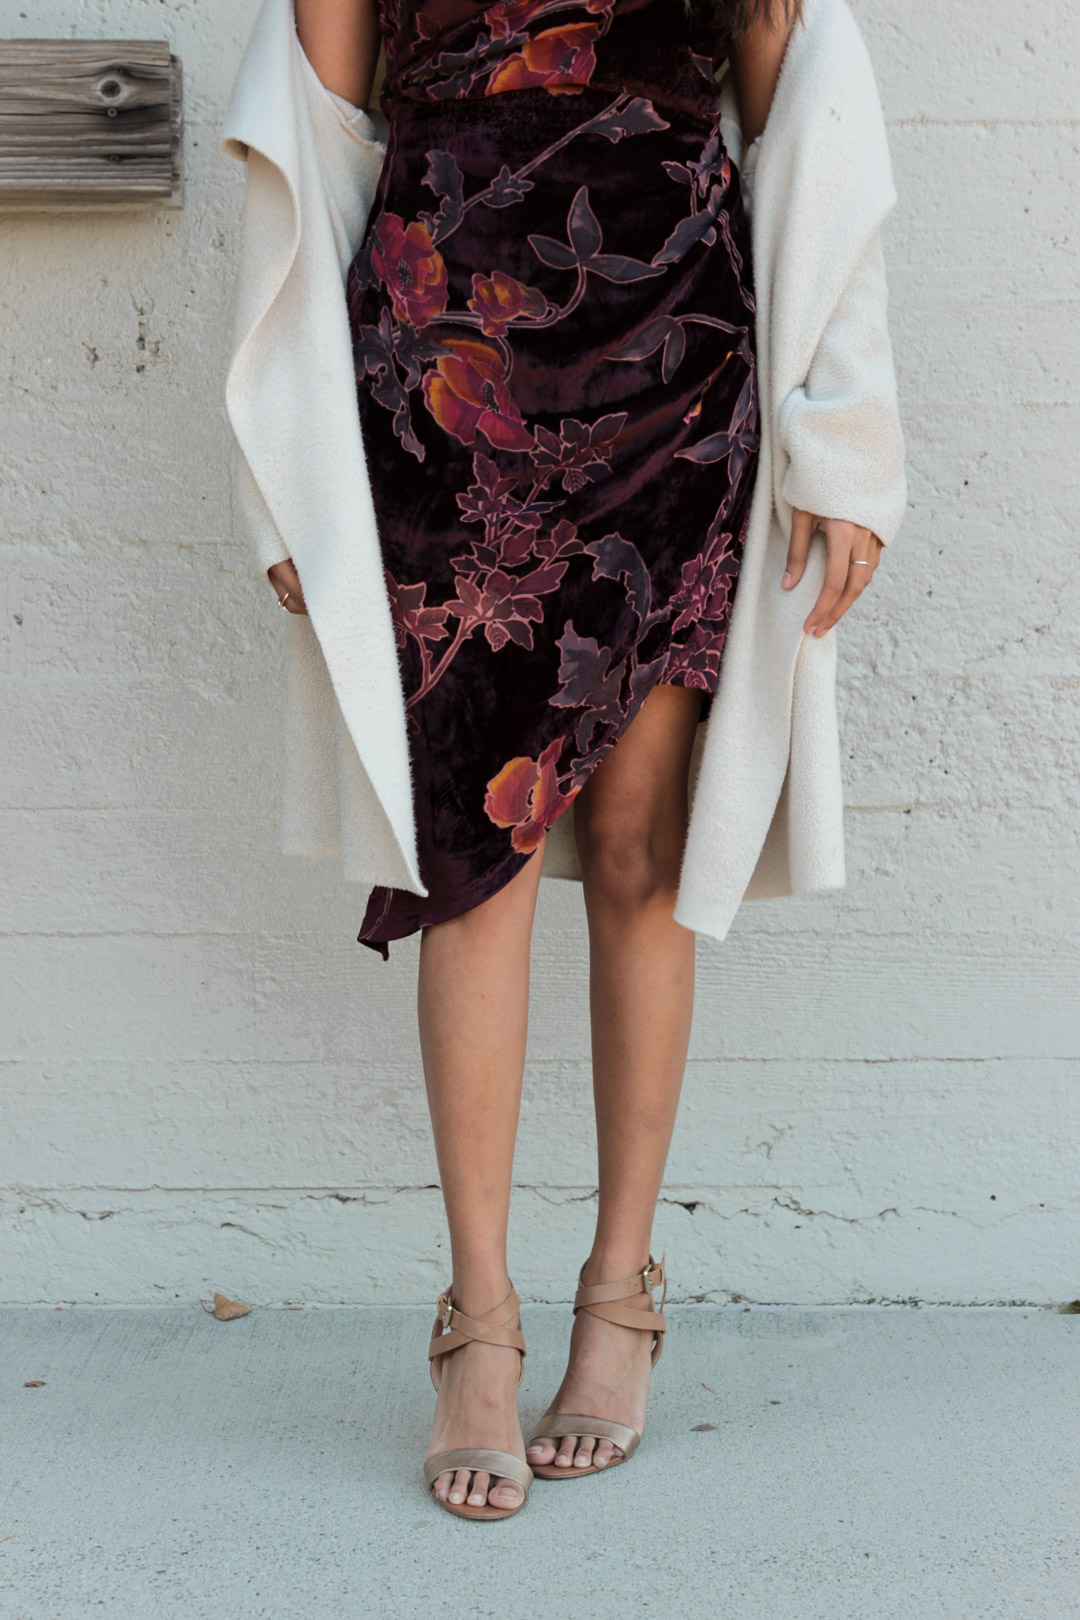 velvet-wrap-floral-dress-nye-party-style-blogger 6